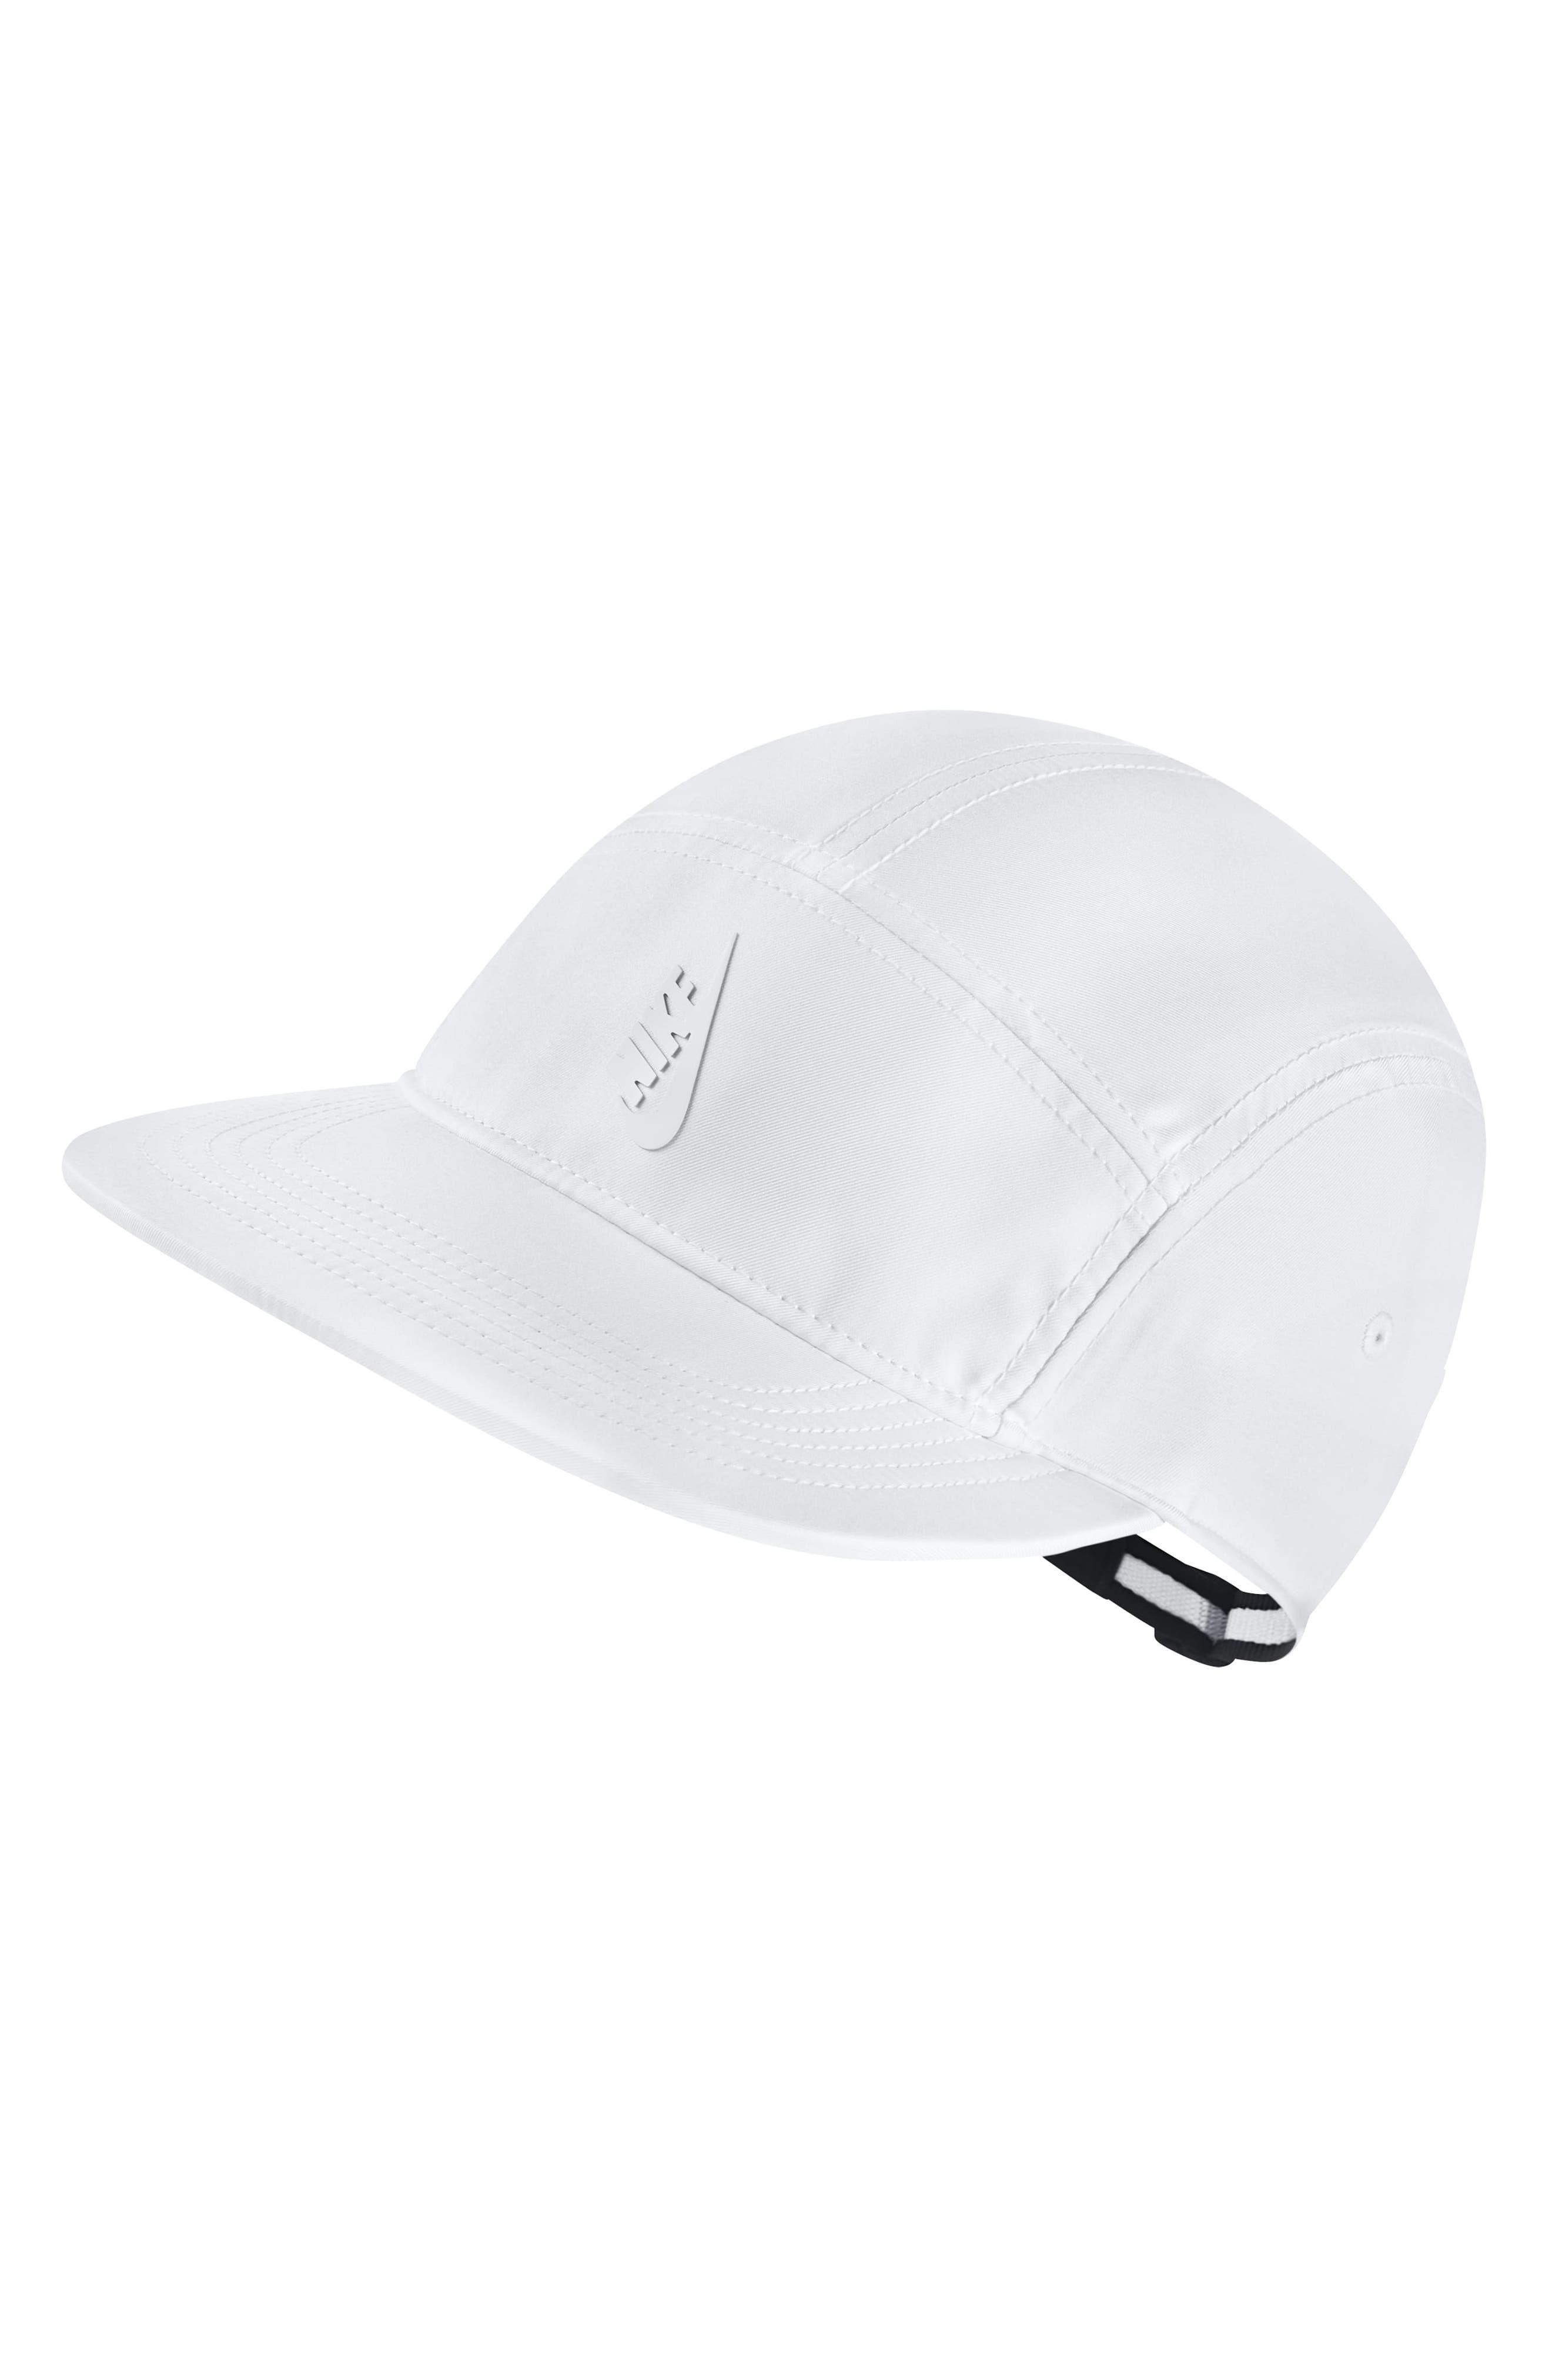 LAB BASEBALL CAP - WHITE